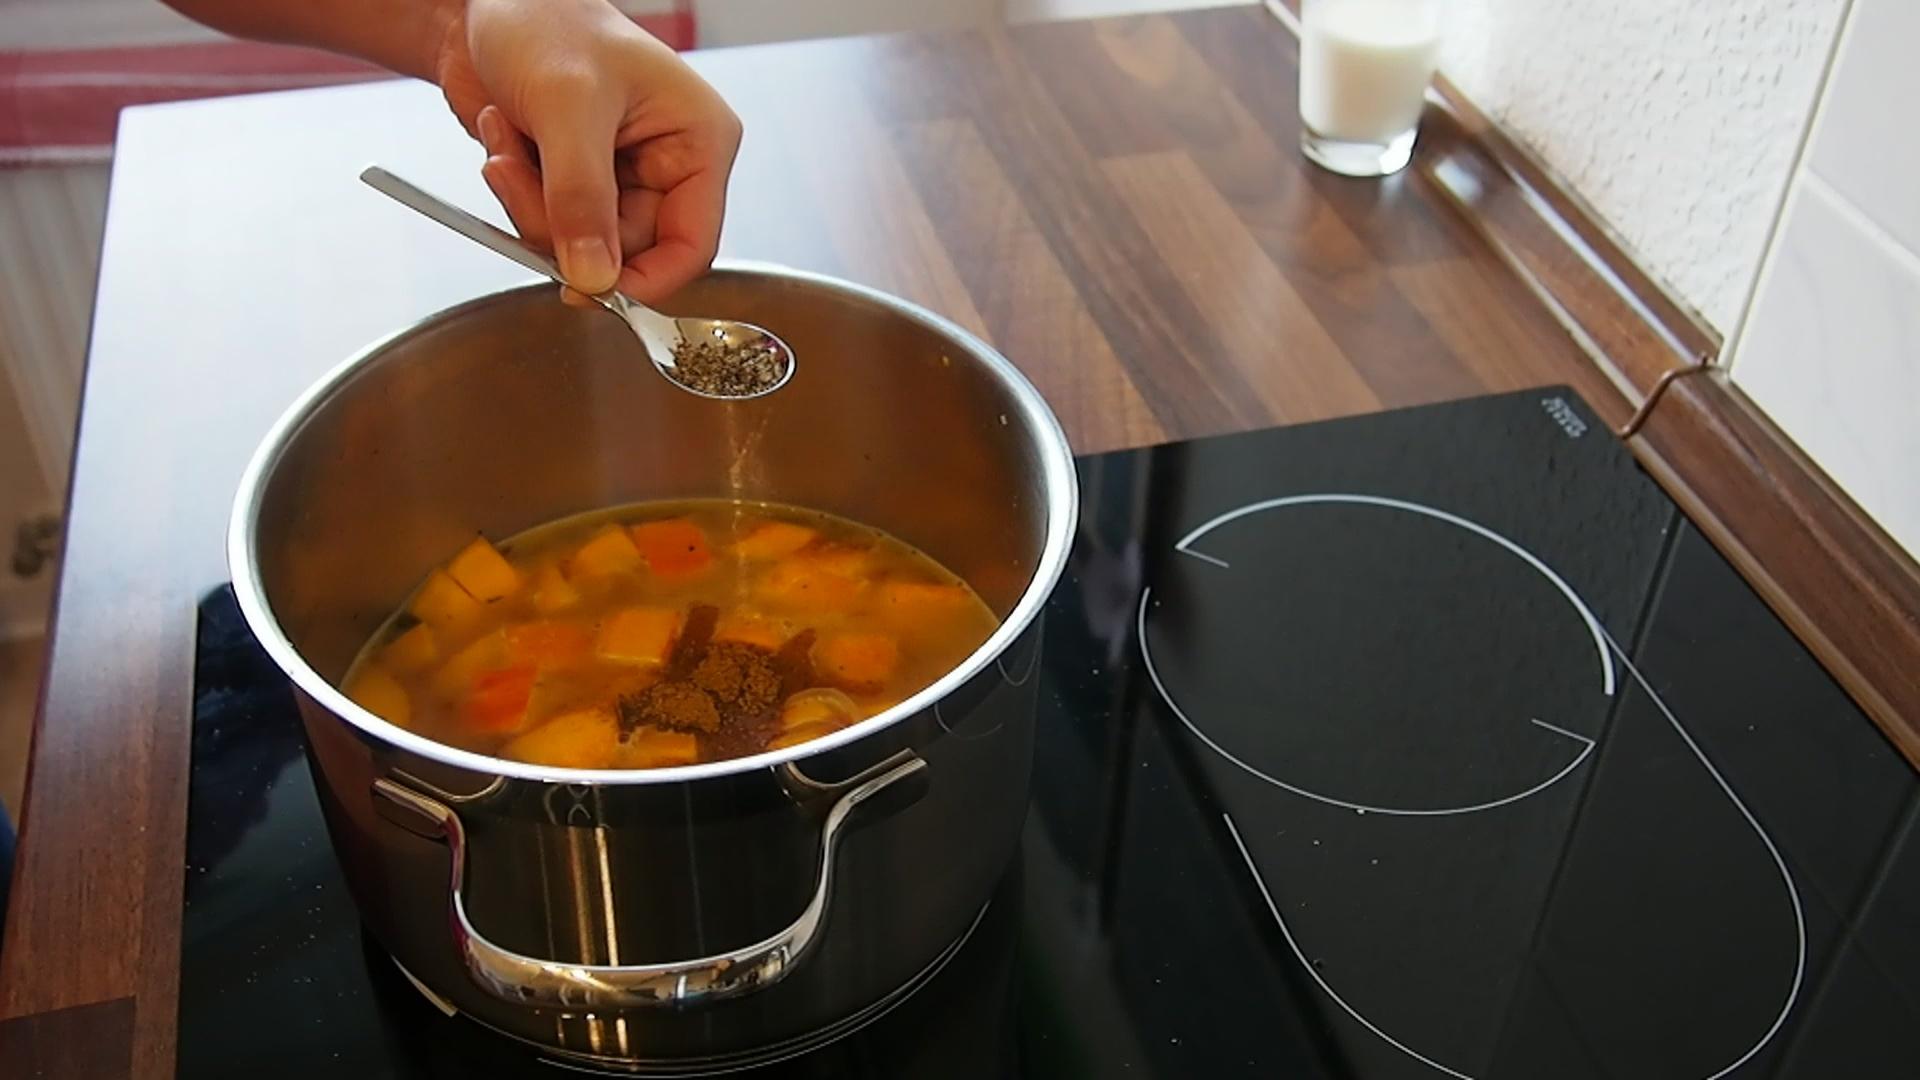 2014-10-27-Kürbis-Curry-Suppe-22.jpg